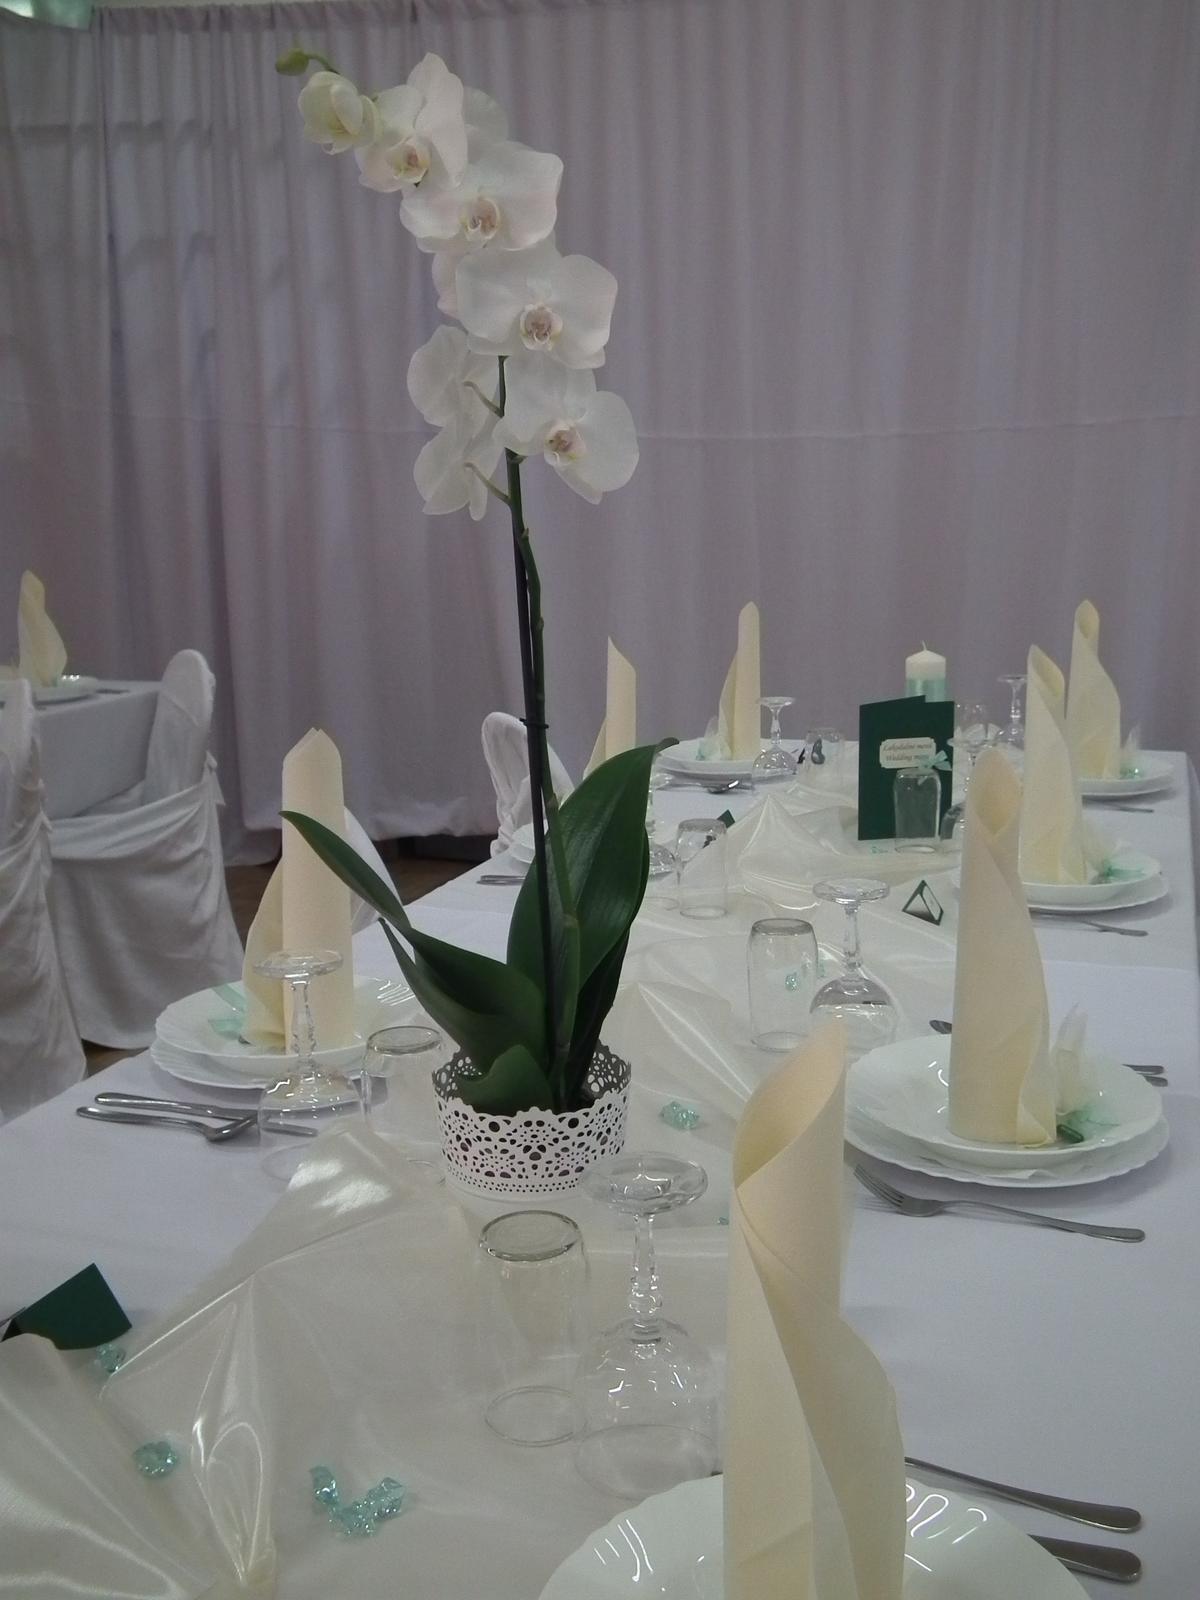 kamarátka mala biele orchideie... - Obrázok č. 1